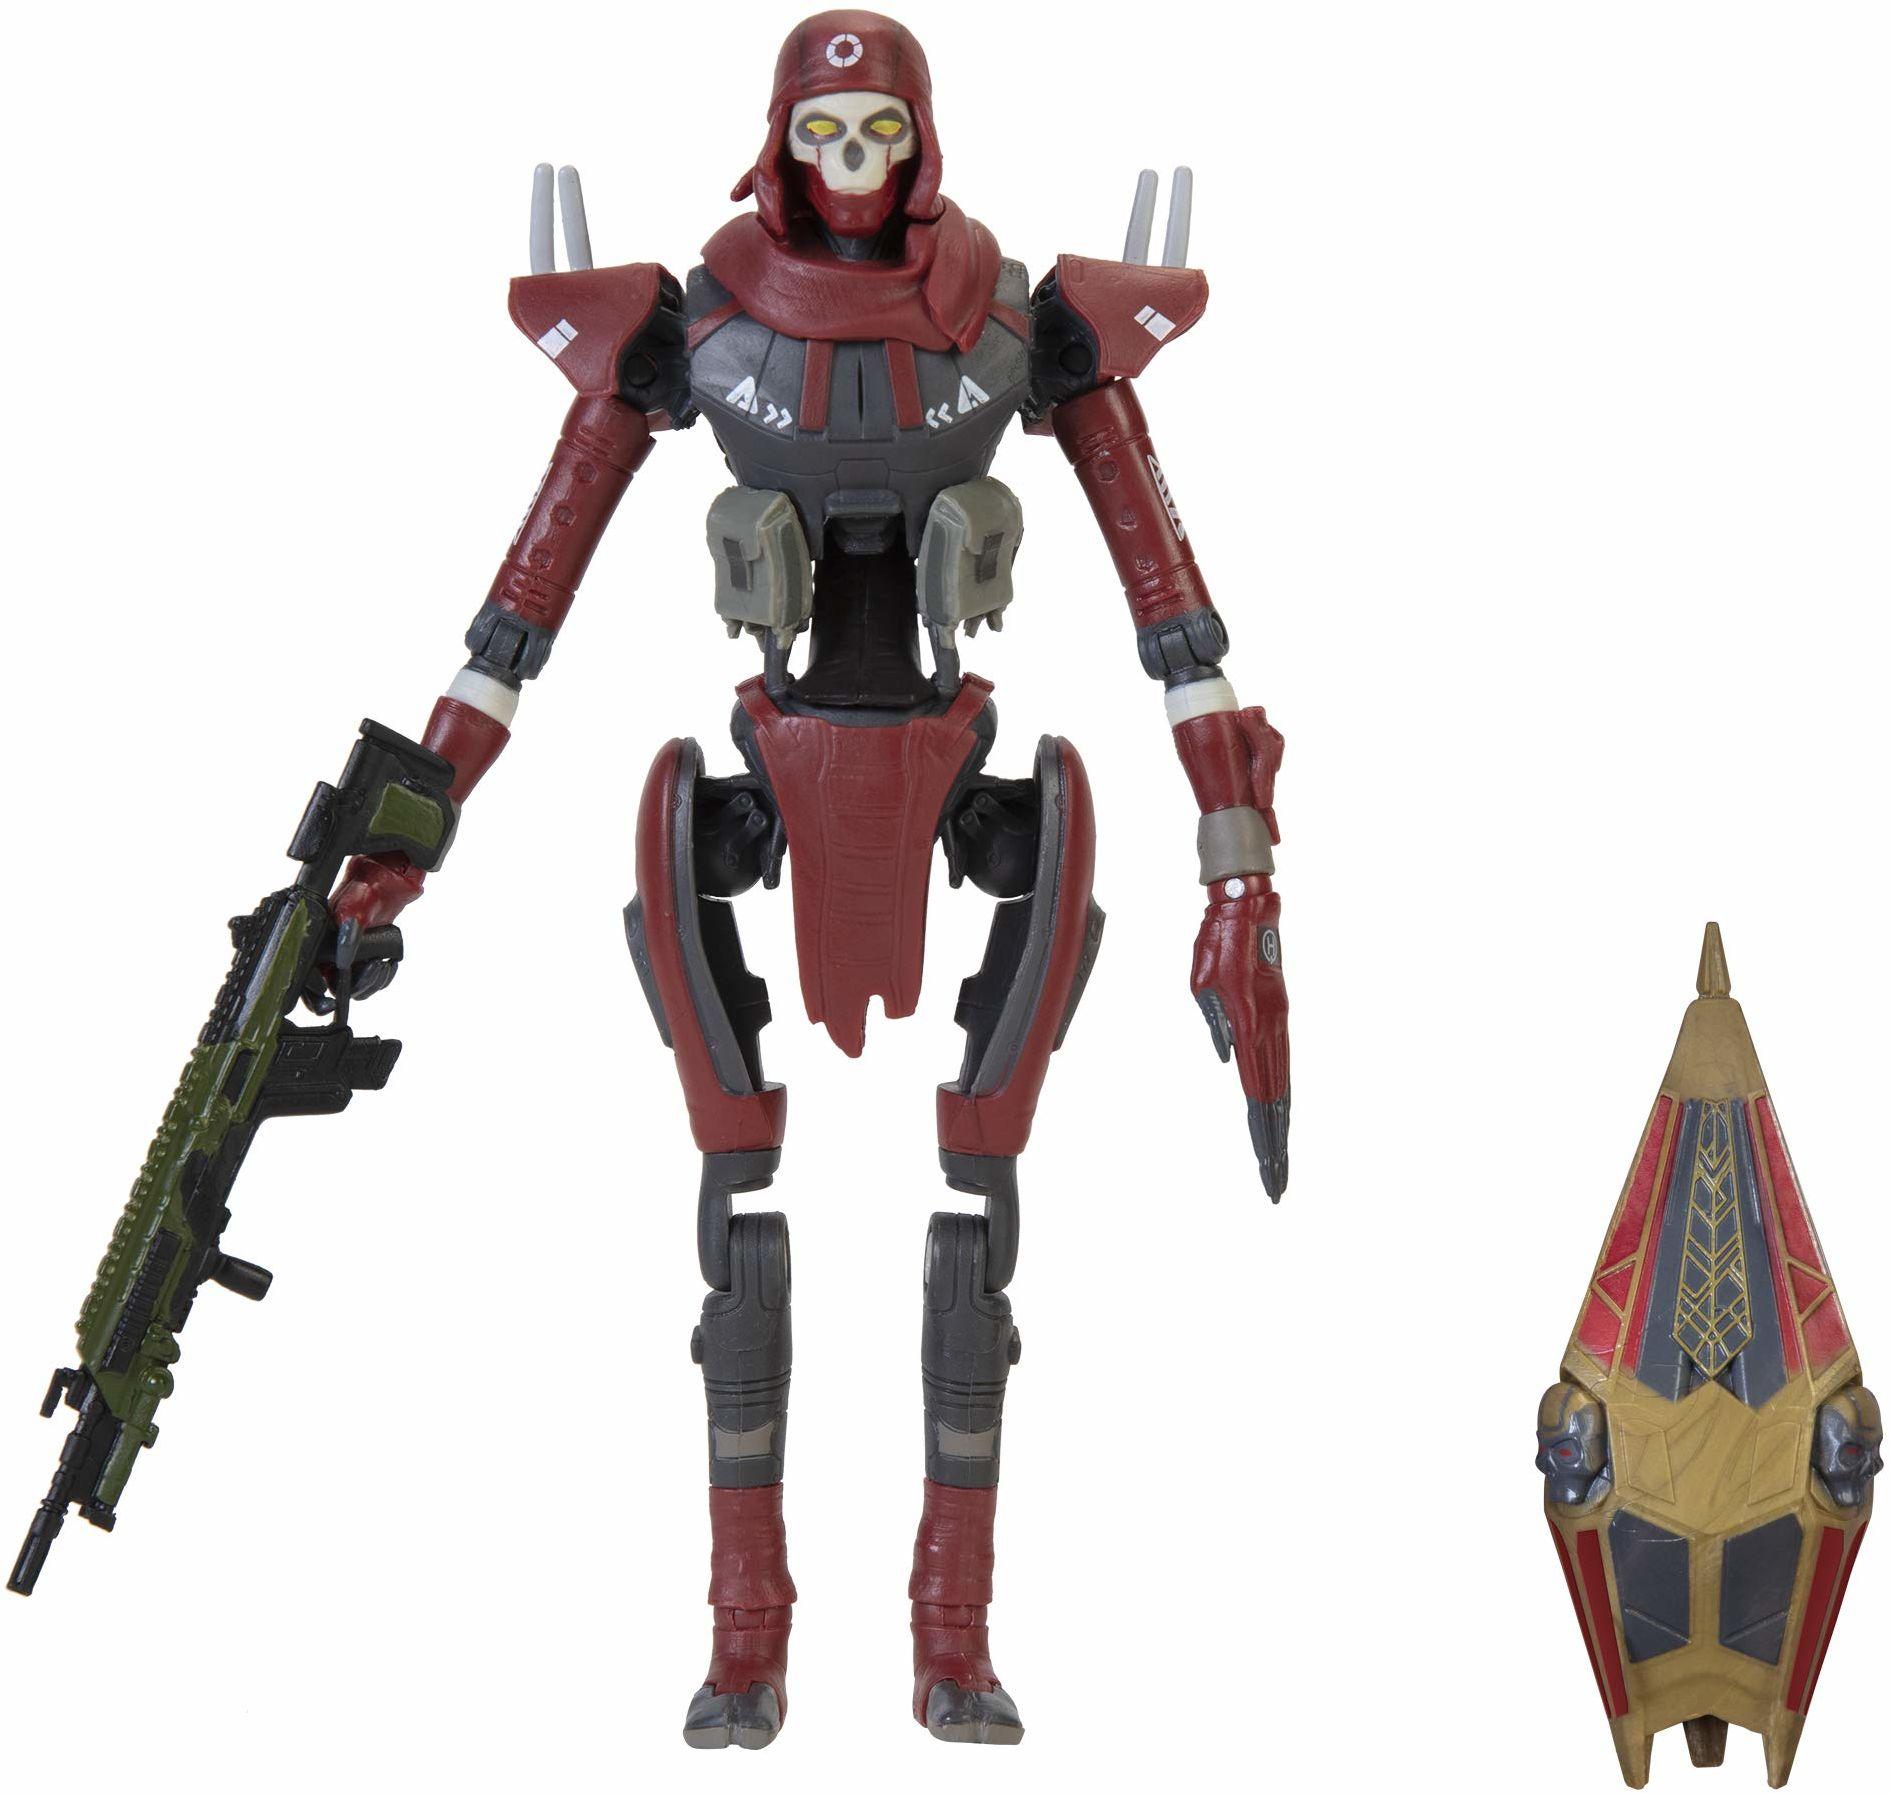 APEX Legends 407174 figurka akcji, Revenant